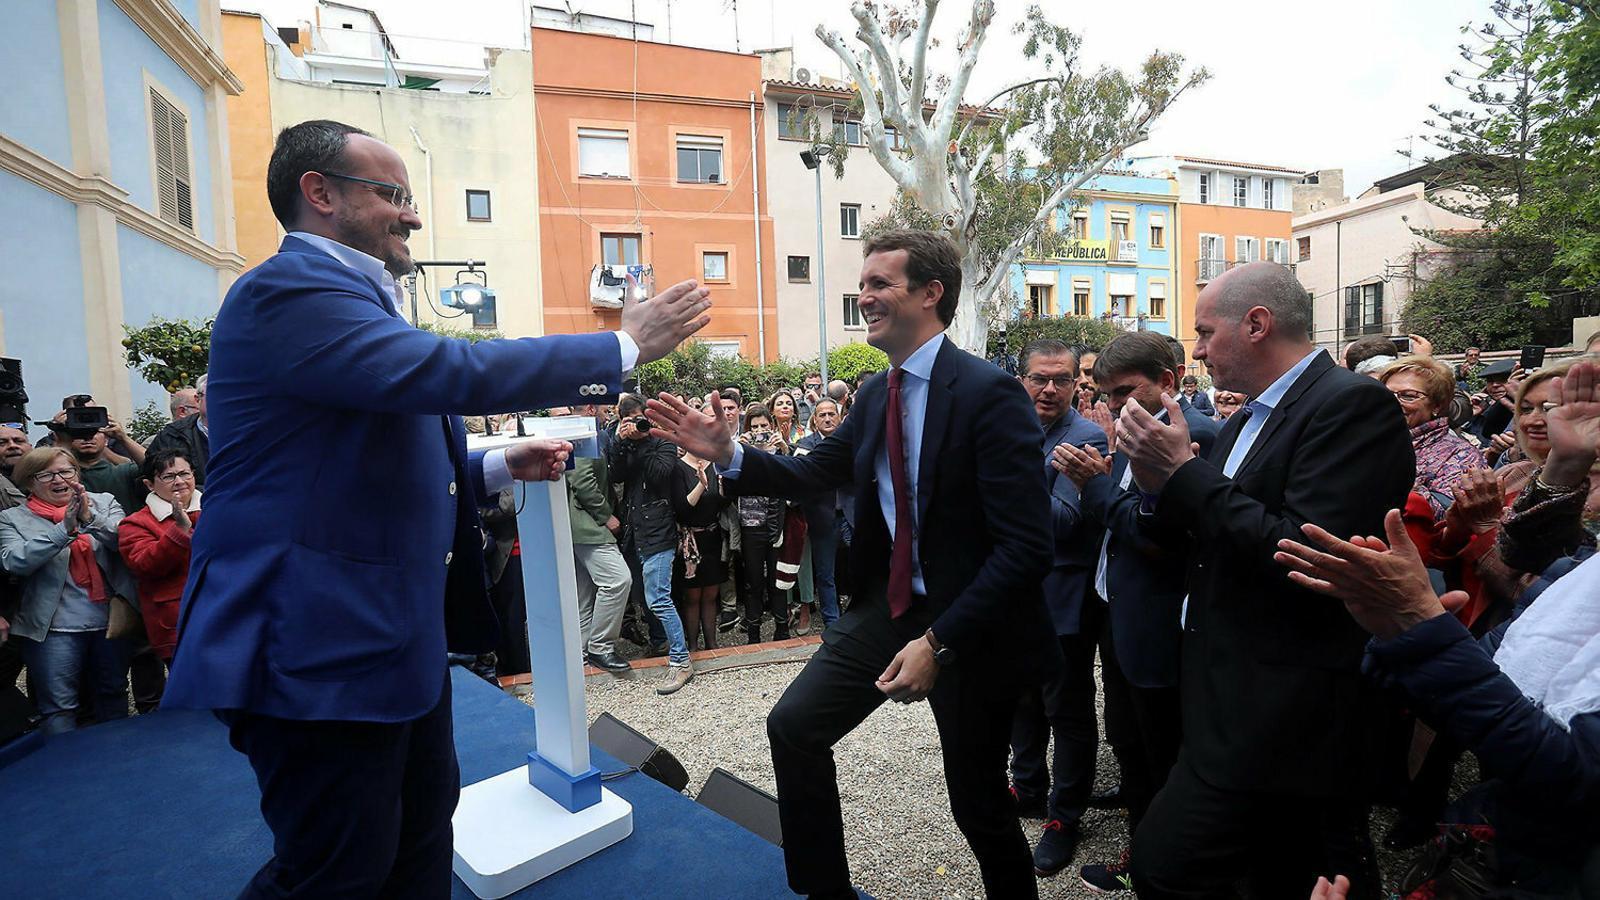 El líder del PP, Pablo Casado, saluda Alejandro Fernández aquest divendres a Tarragona.